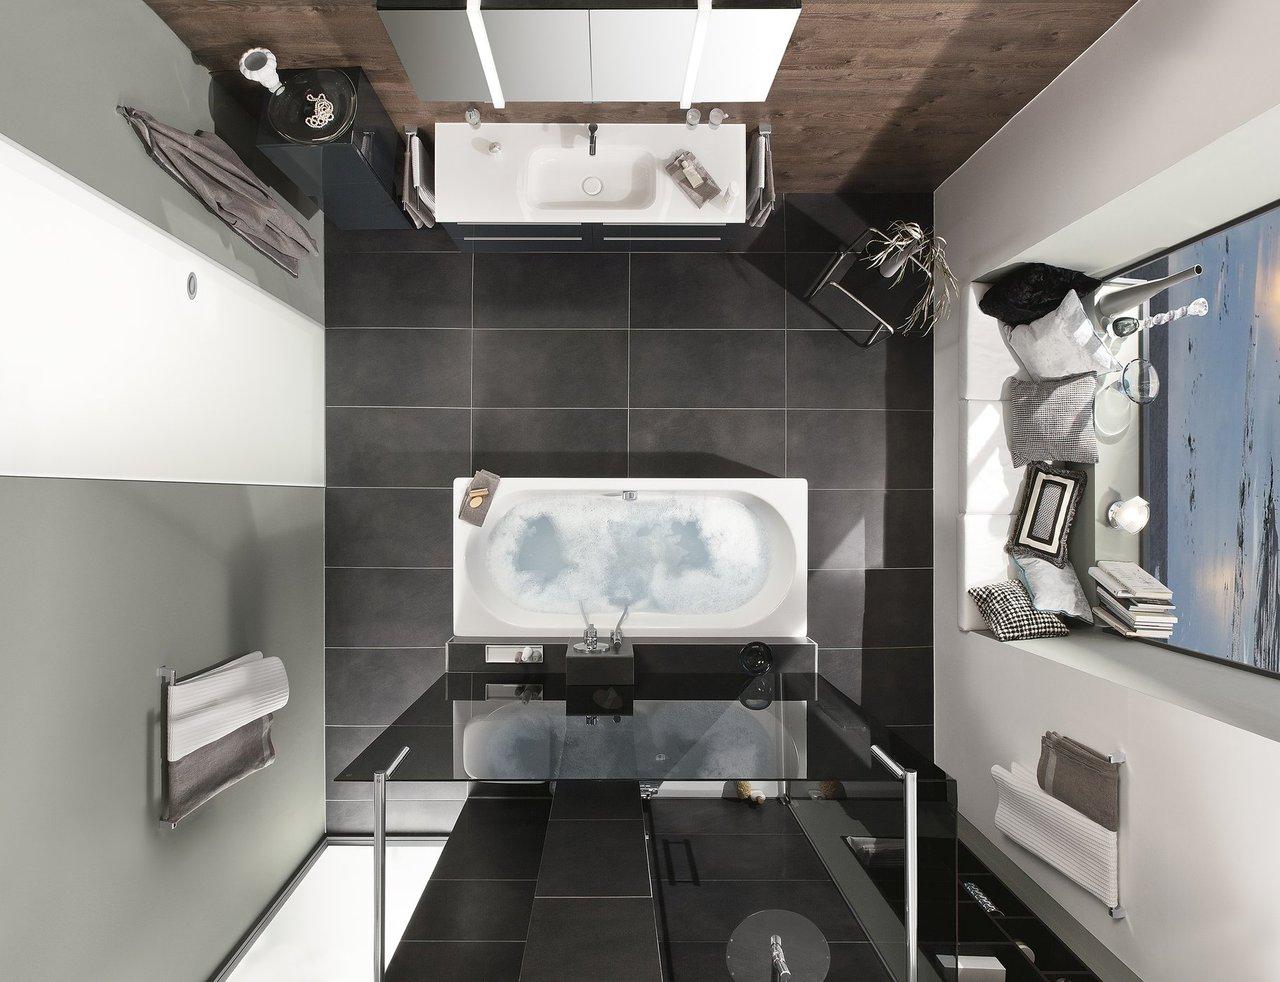 kleine b der fx ruch kg. Black Bedroom Furniture Sets. Home Design Ideas